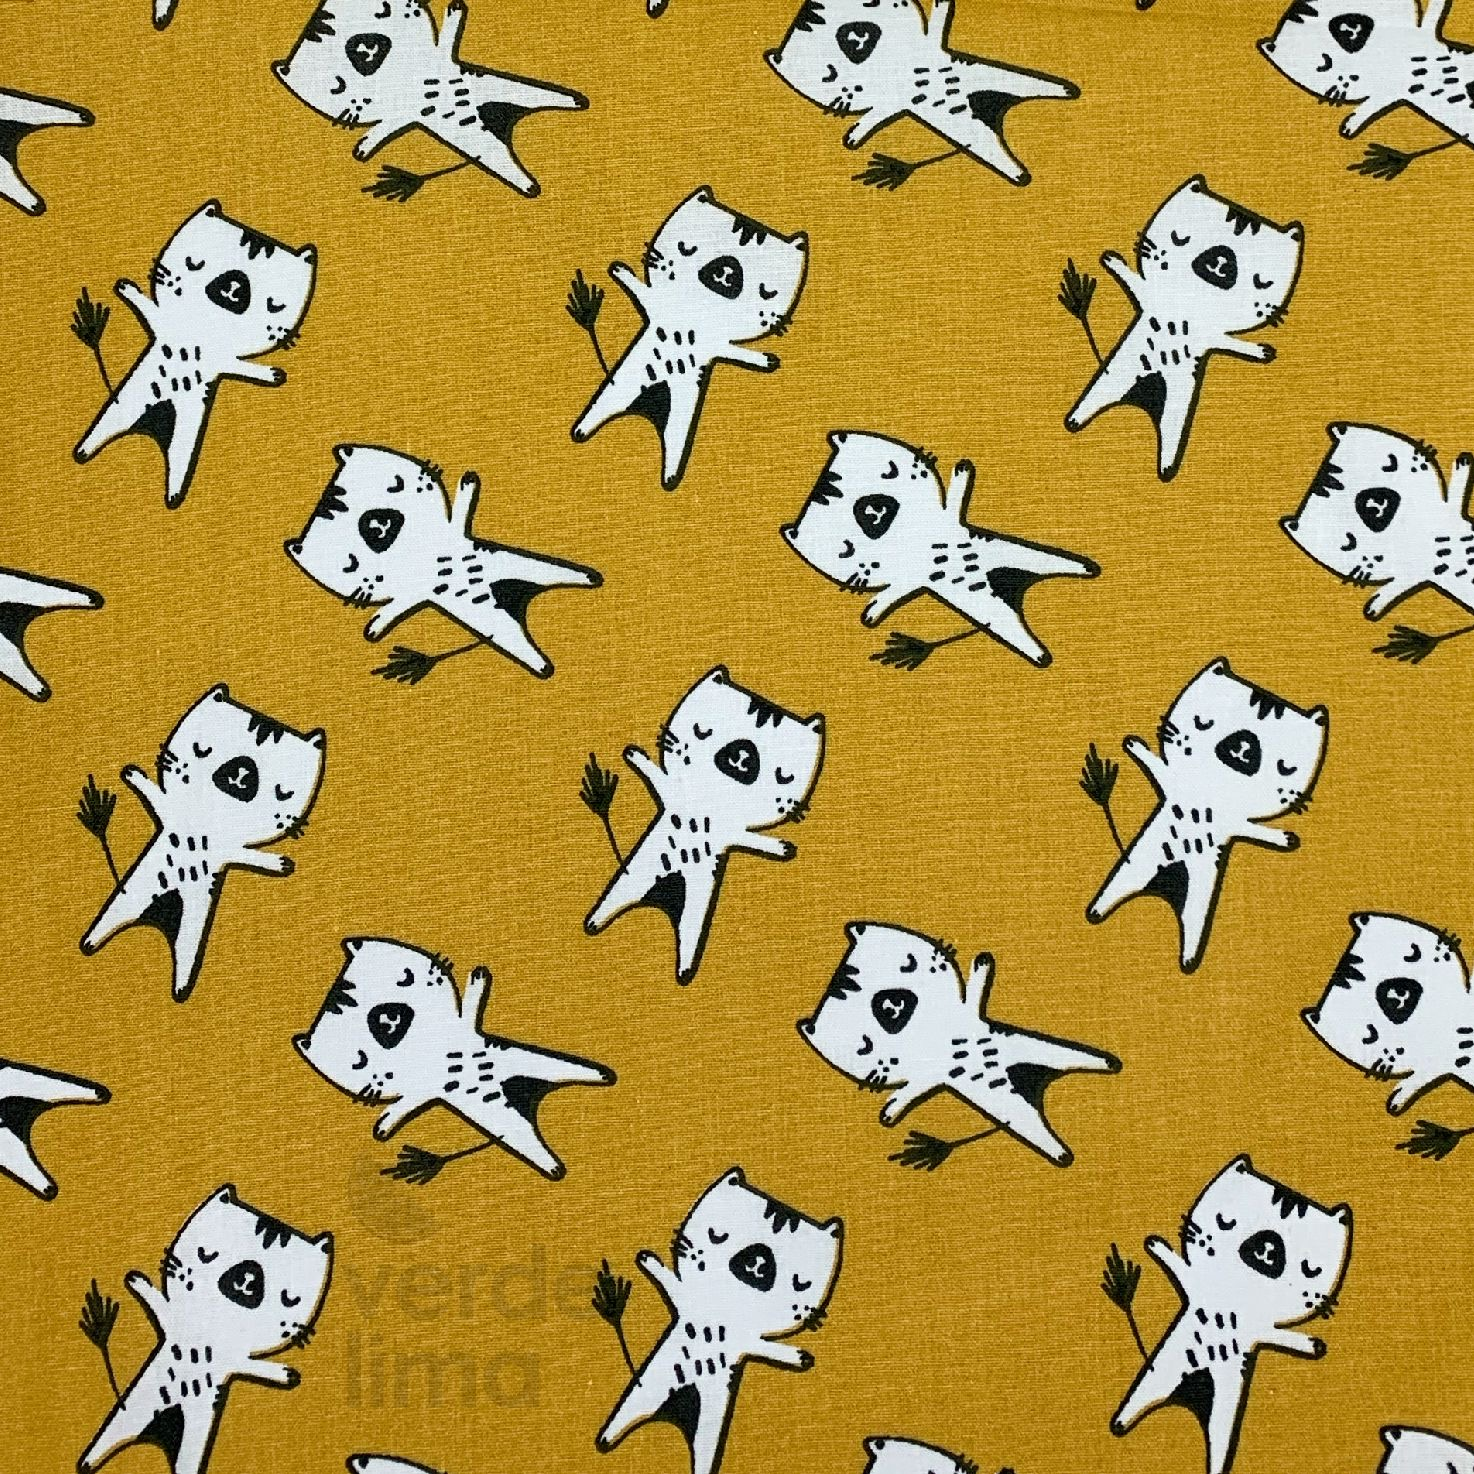 Astro kitty and friends - gatos fundo amarelo